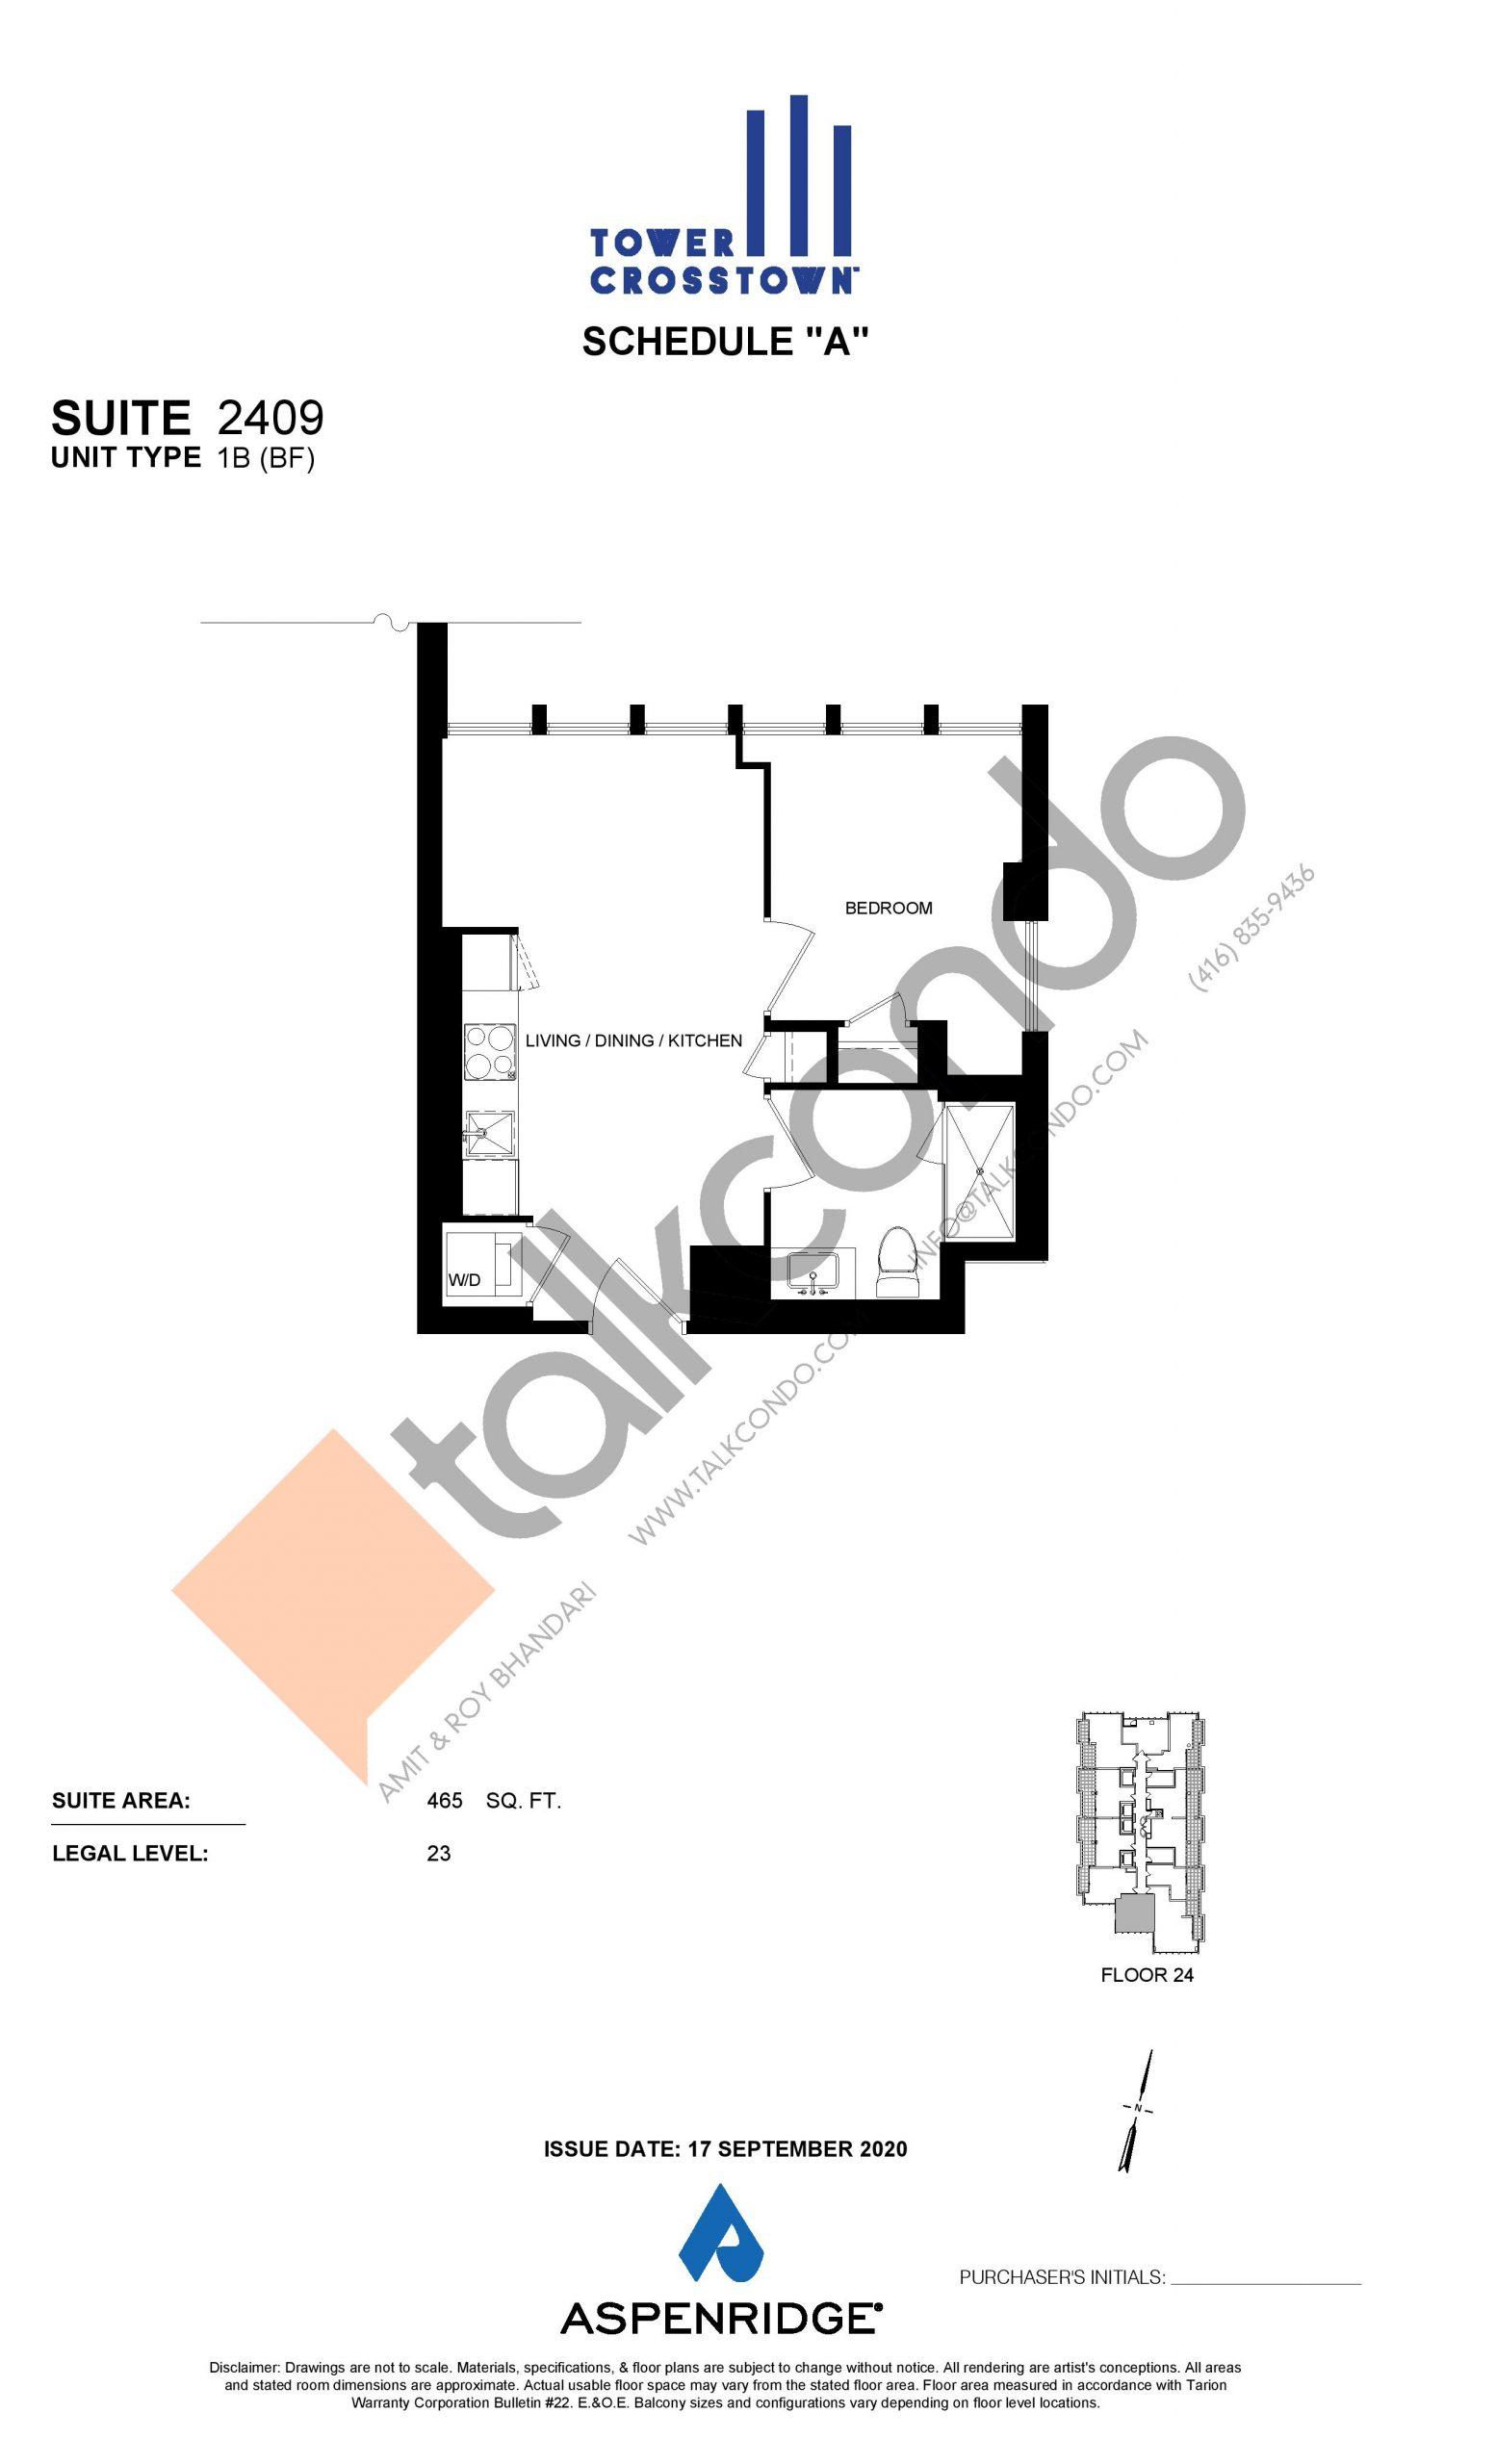 Suite 2409 - IB (BF) Floor Plan at Crosstown Tower 3 Condos - 465 sq.ft